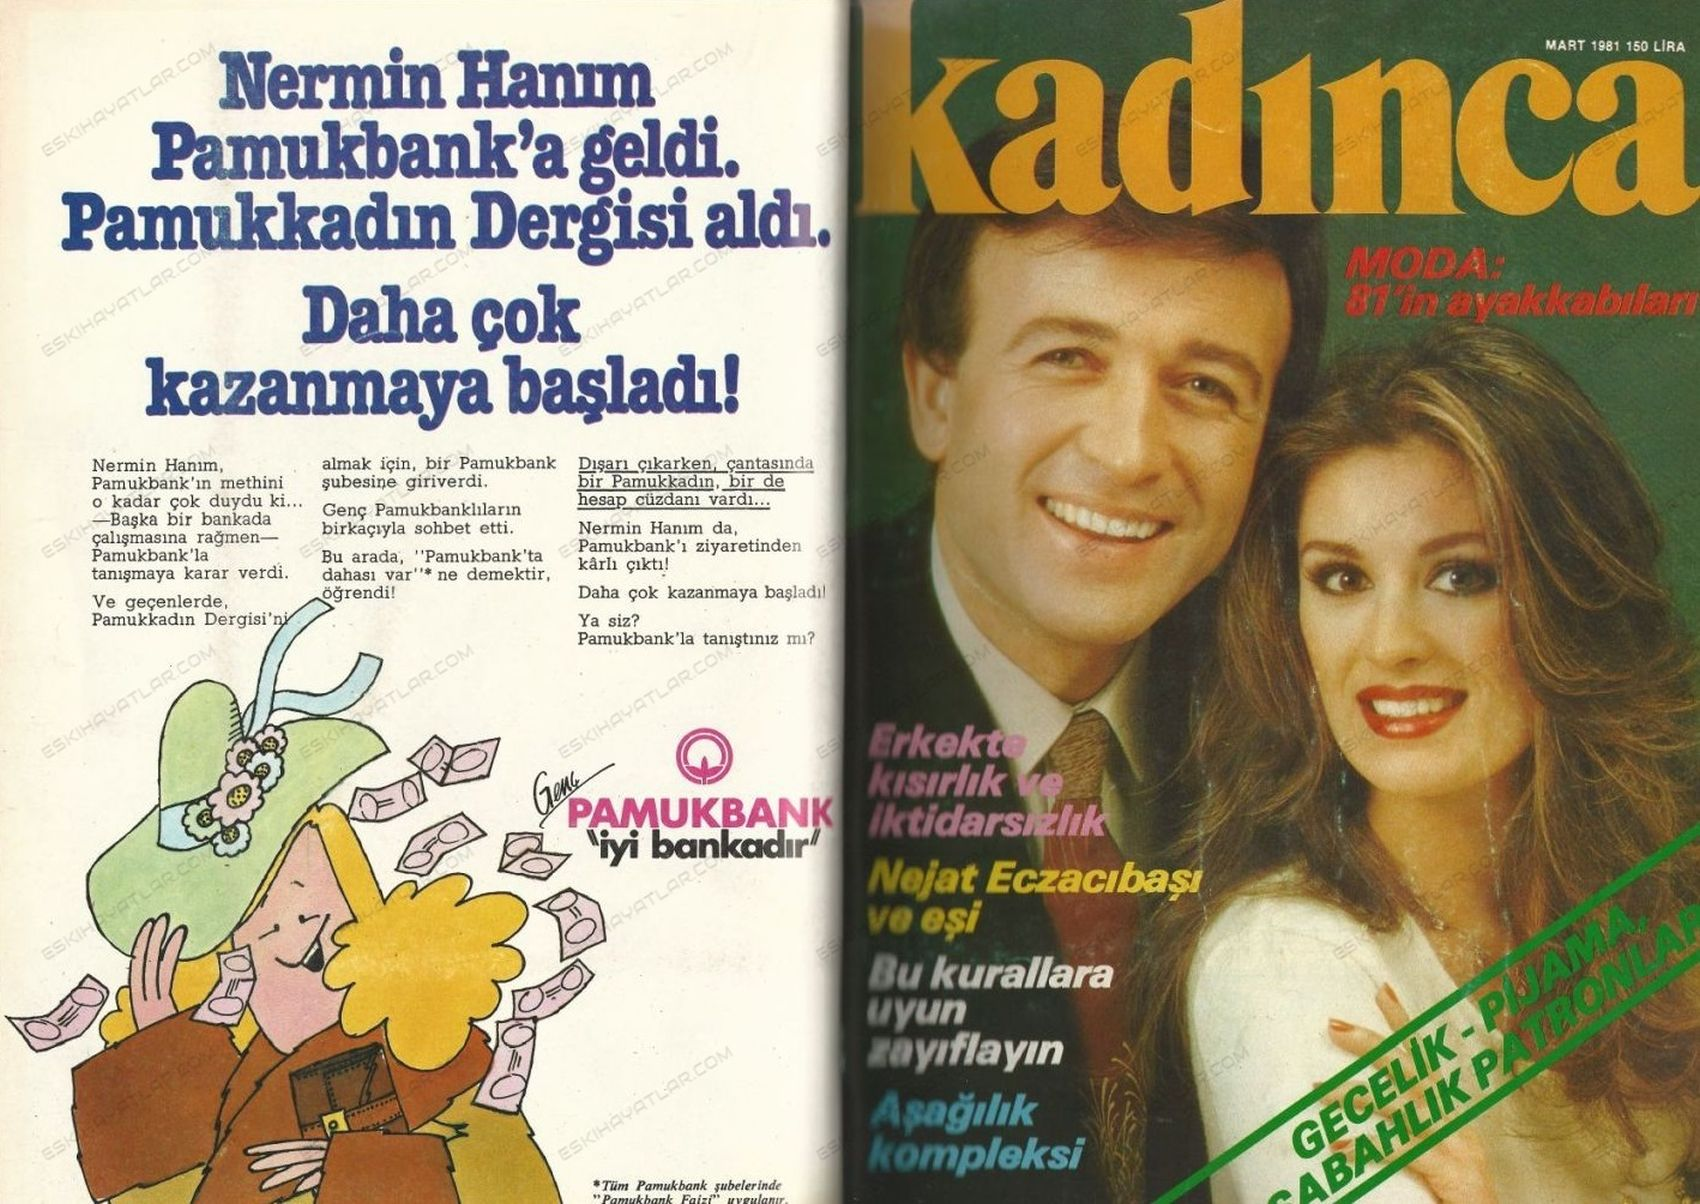 0209-erol-evgin-roportaji-1981-kadinca-dergisi (4)